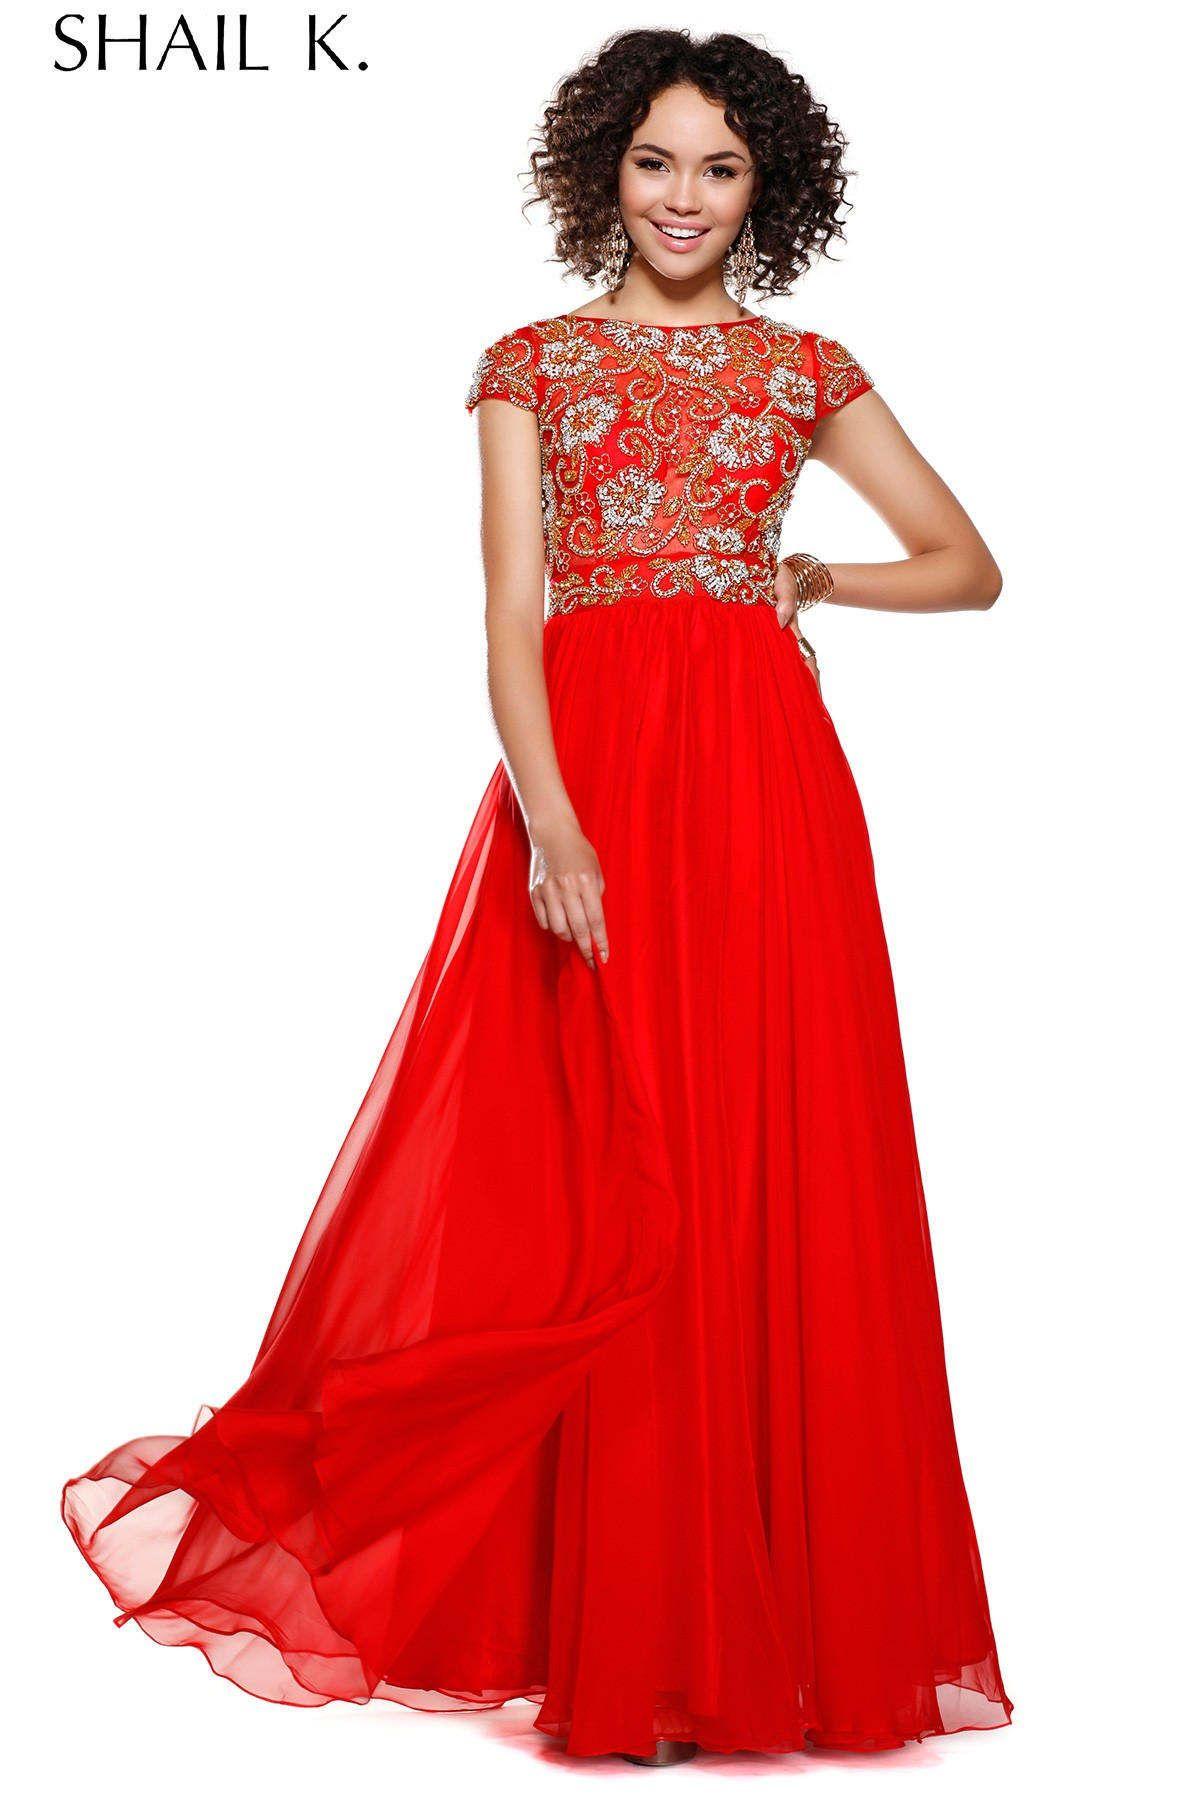 8th grade formal dresses long sleeve